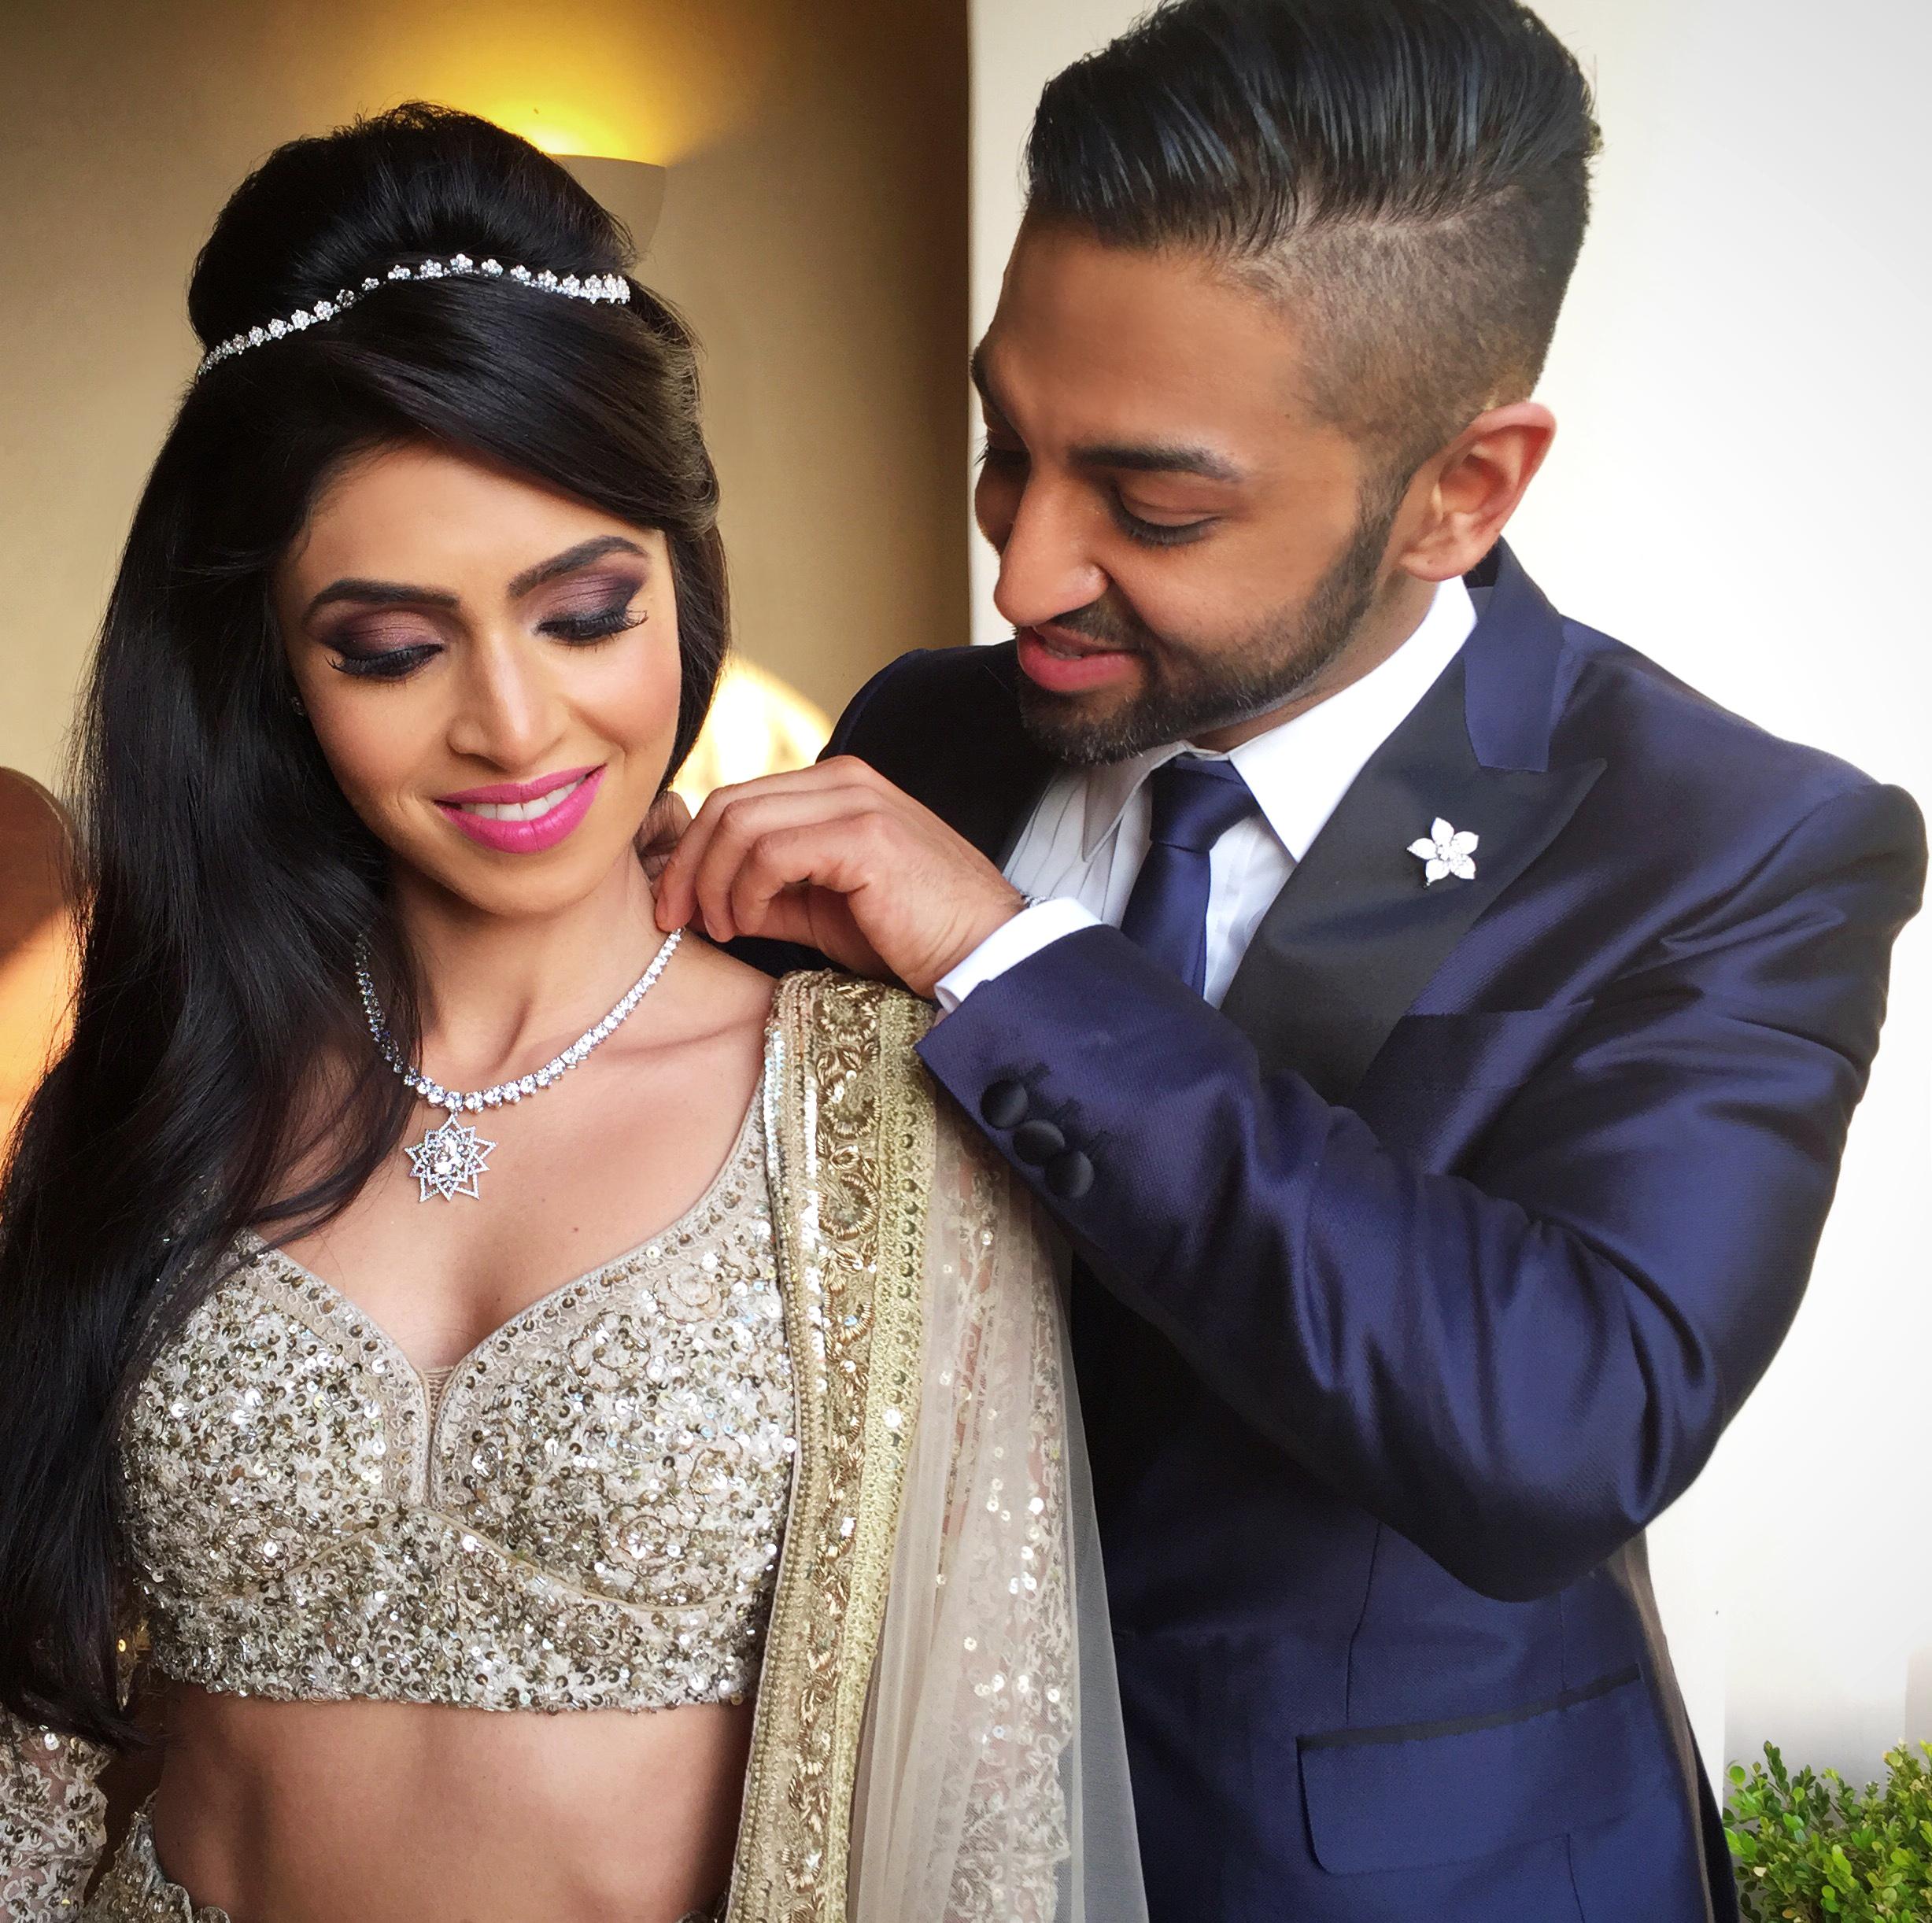 __ZKFJ and Bride.jpg